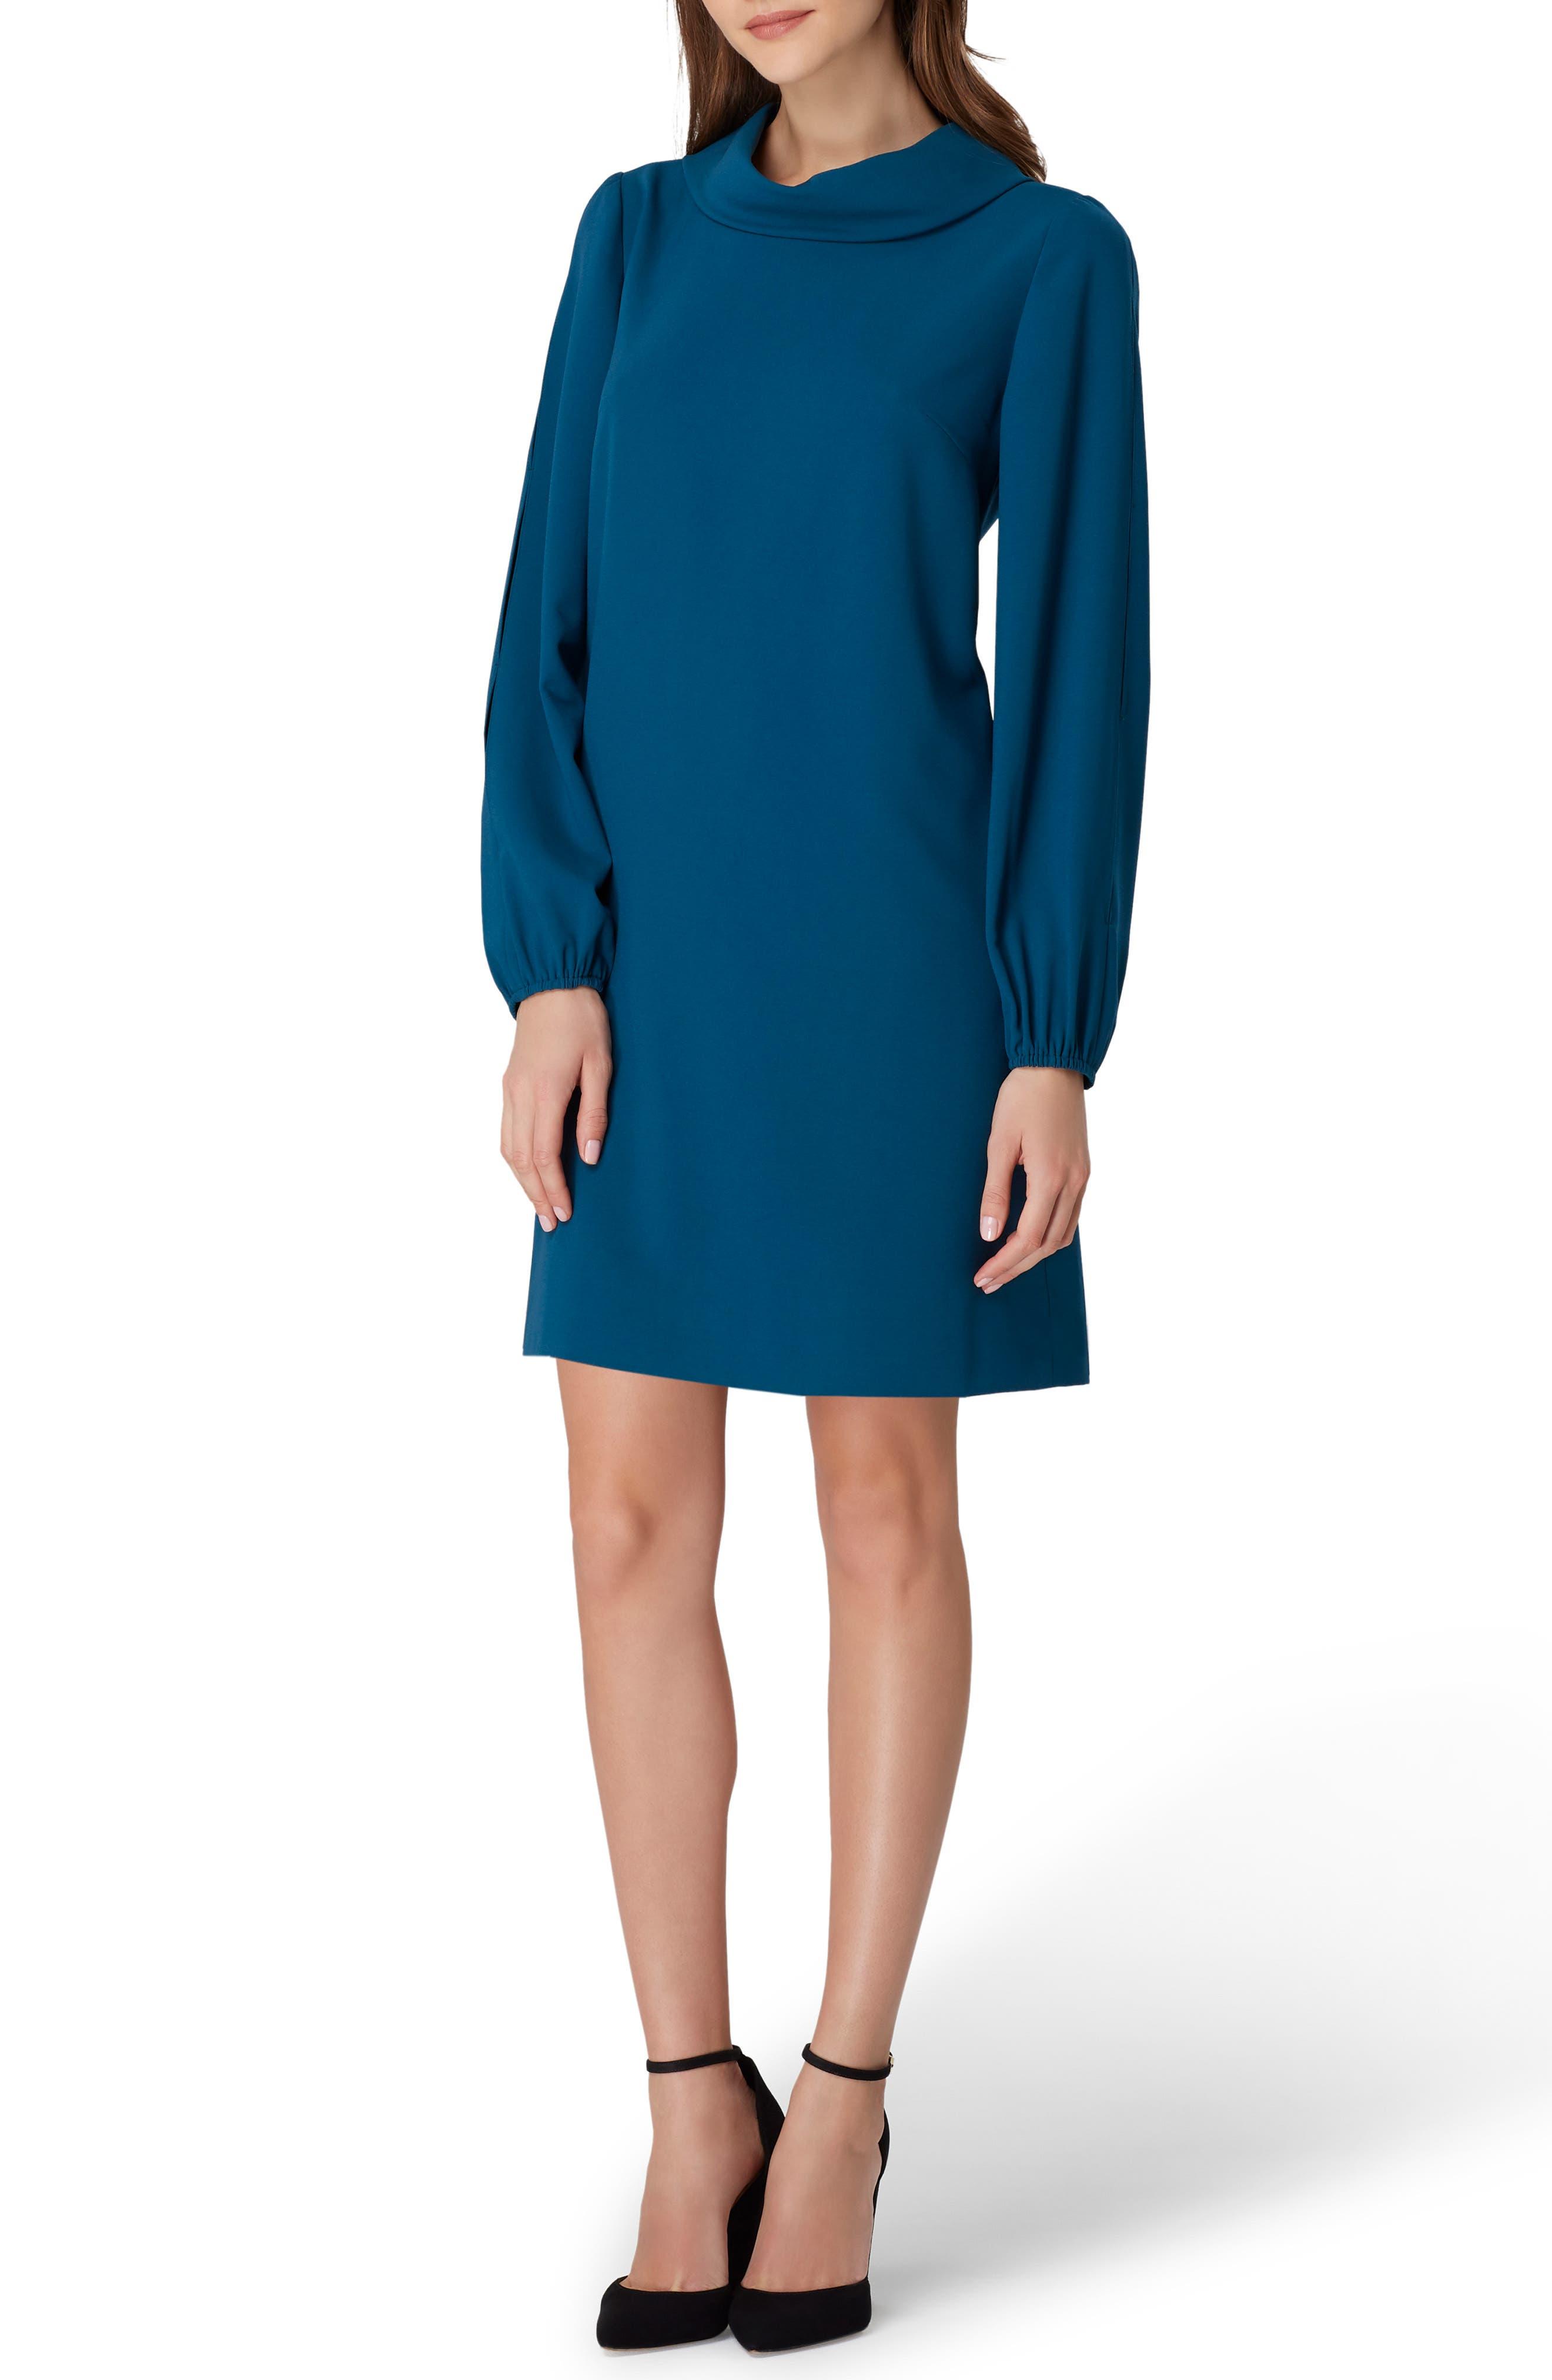 1960s – 70s Cocktail, Party, Prom, Evening Dresses Petite Womens Tahari Crepe Shift Dress Size 14P - Bluegreen $128.00 AT vintagedancer.com